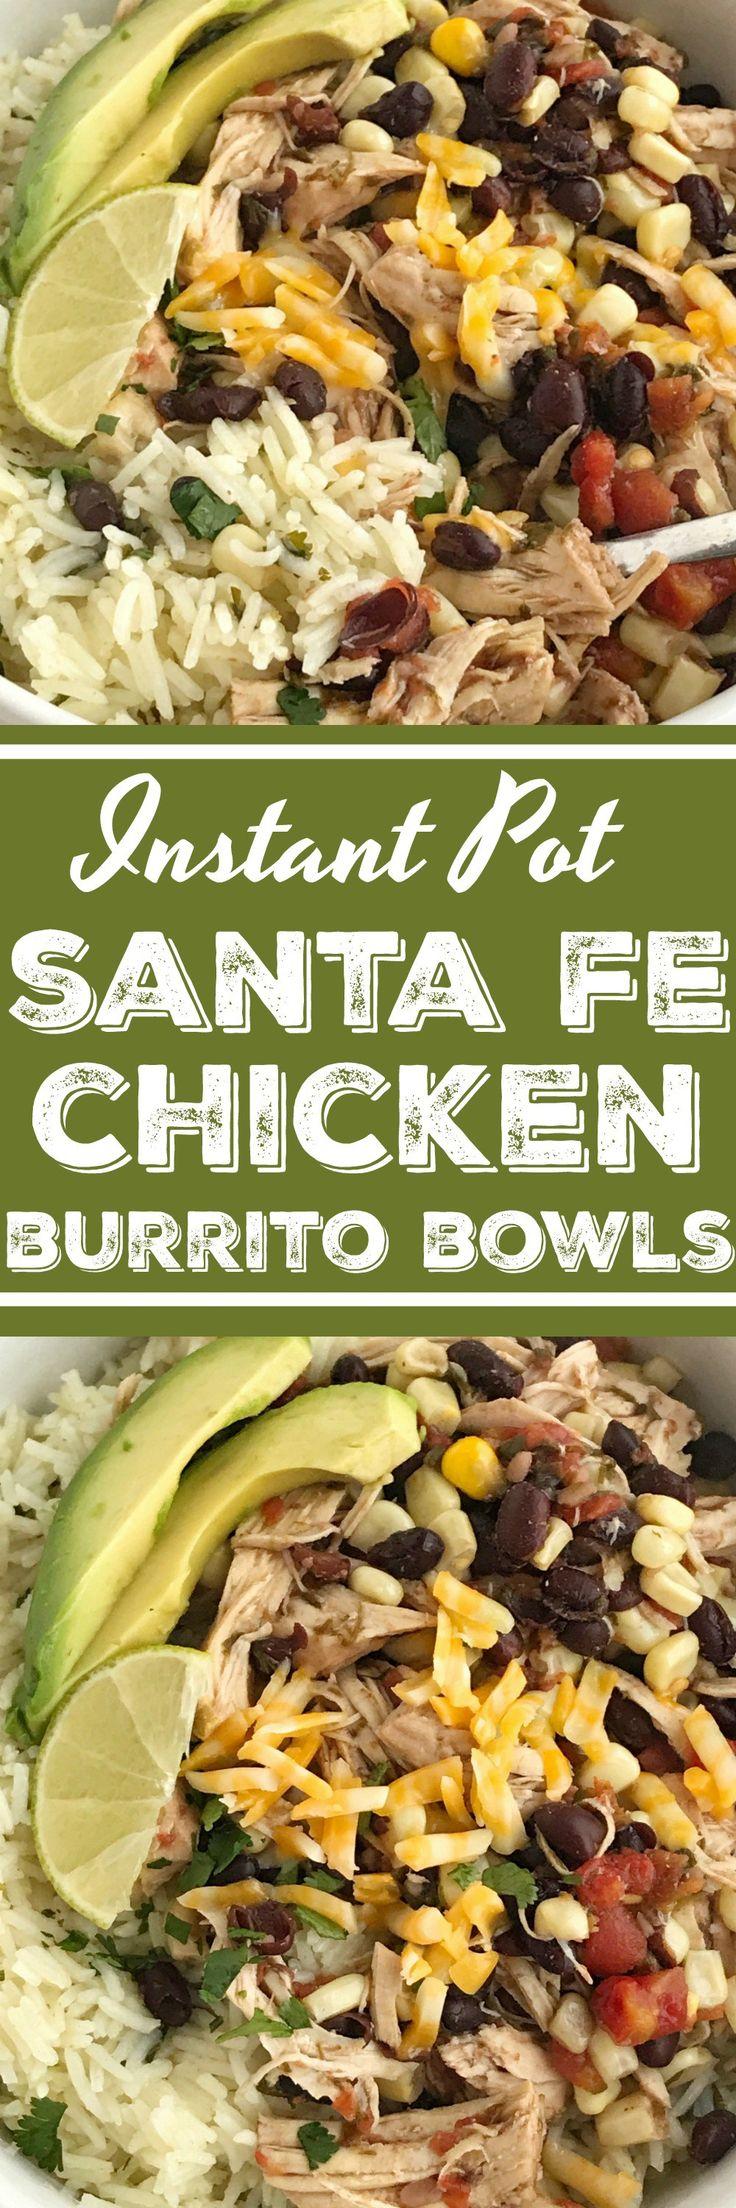 pinterest-instant-pot-santa-fe-chicken-burrito-bowls.jpg 1,000×3,000 pixels